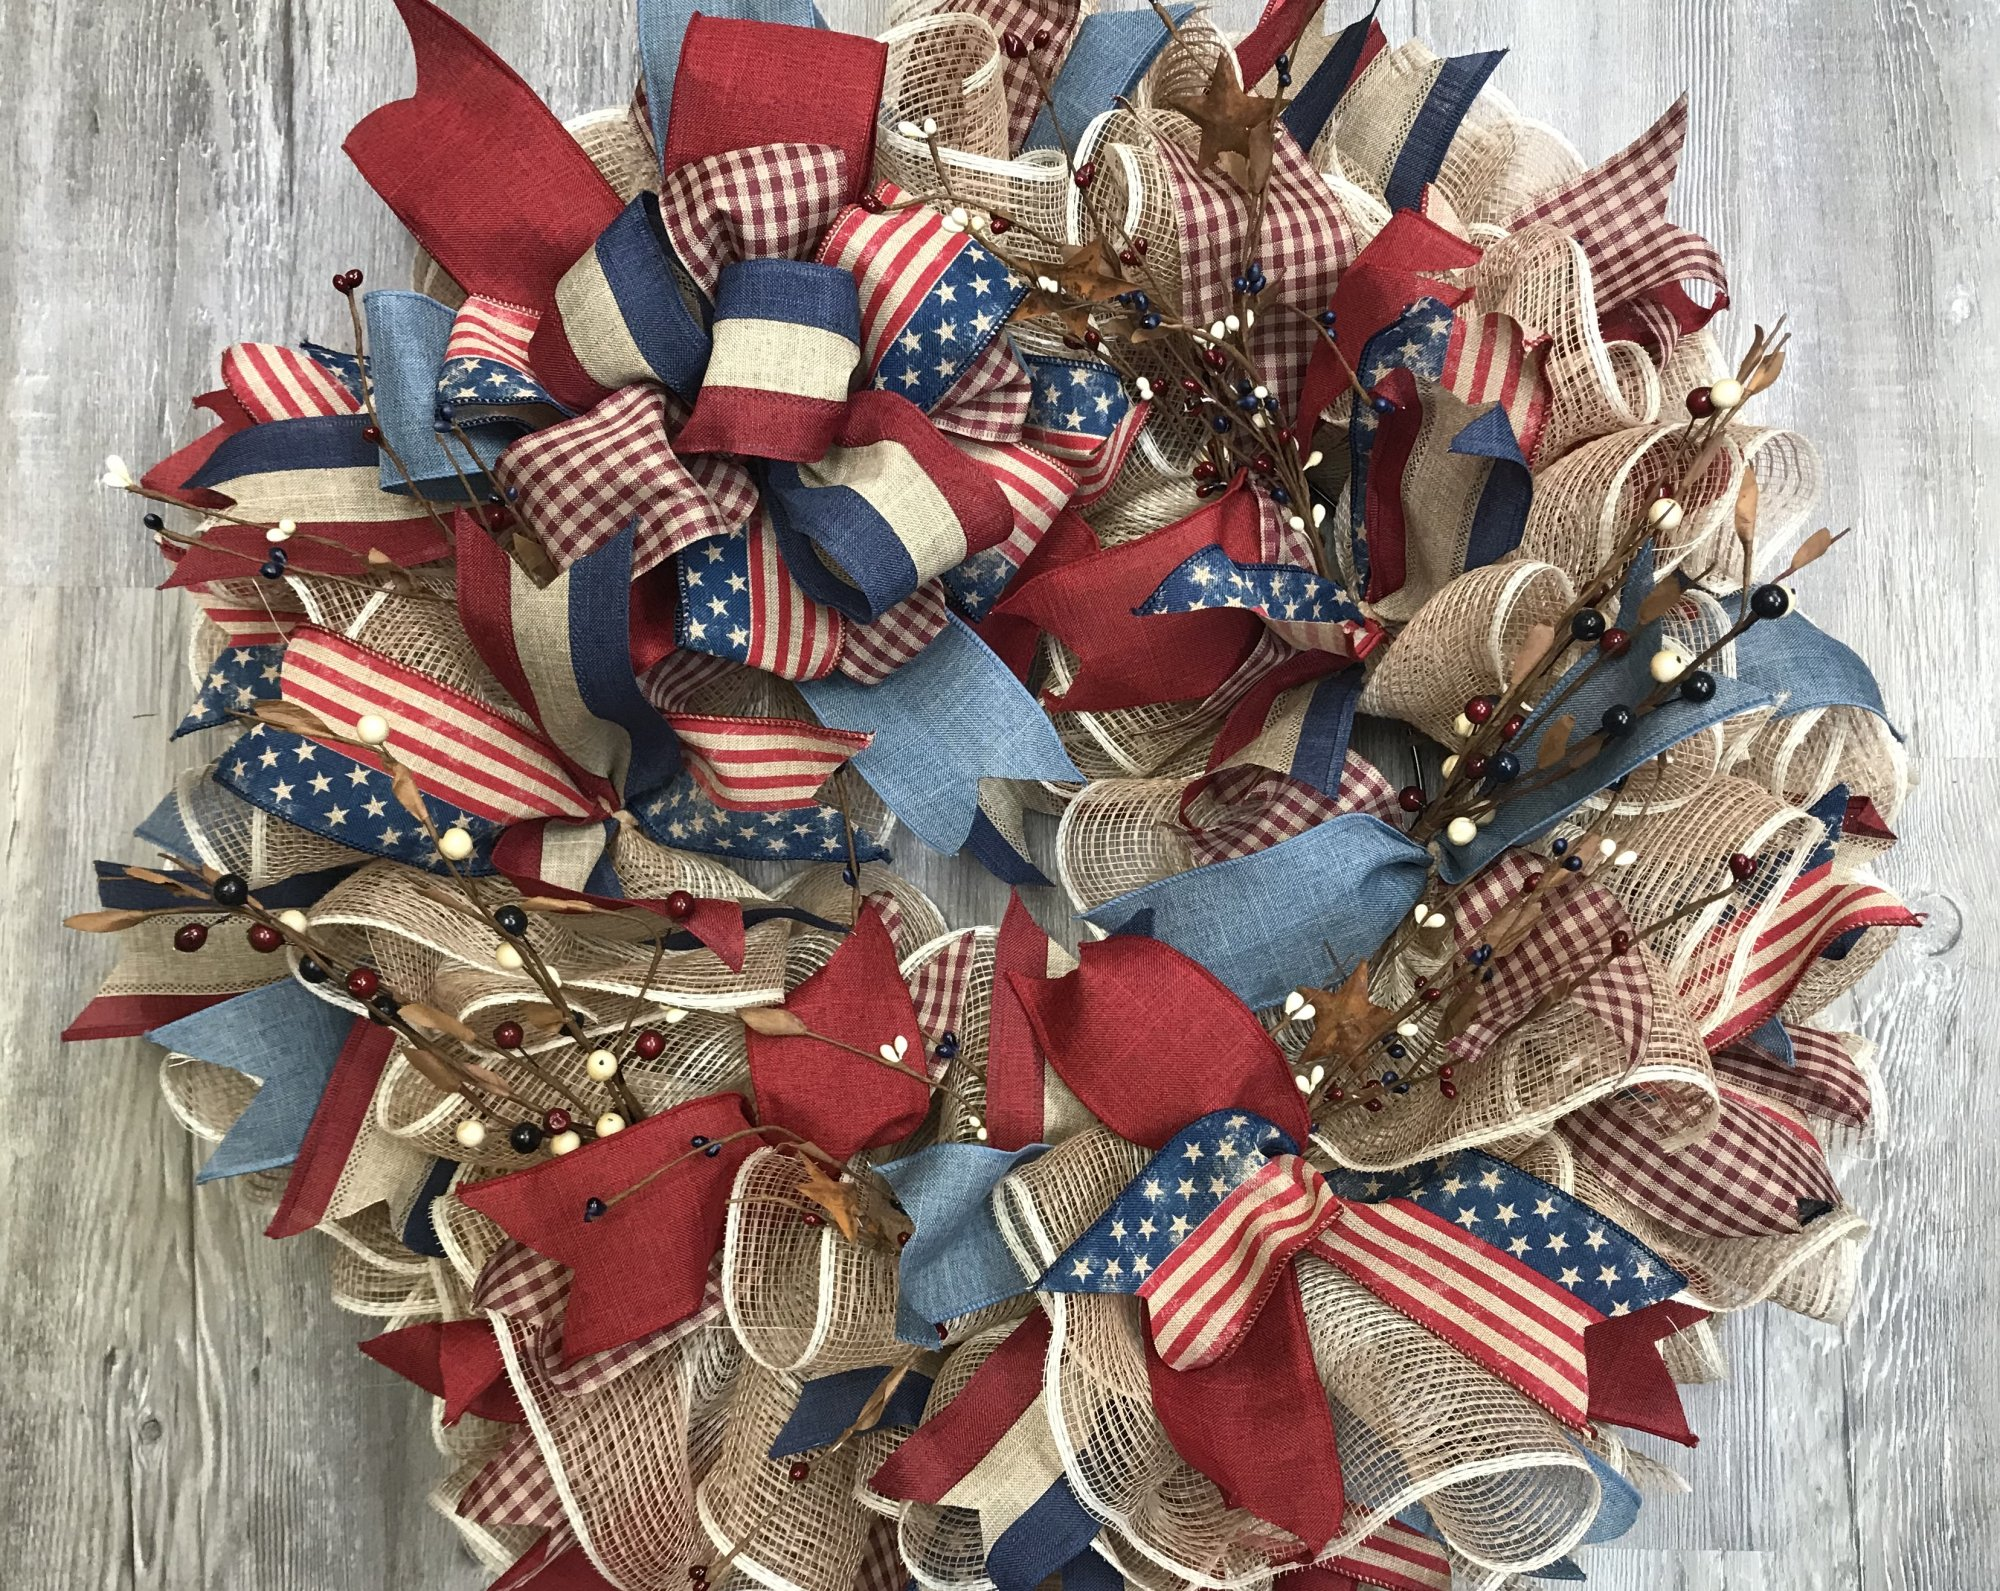 Faded Patriotic Ruffle Ribbon 24 Wreath Kit